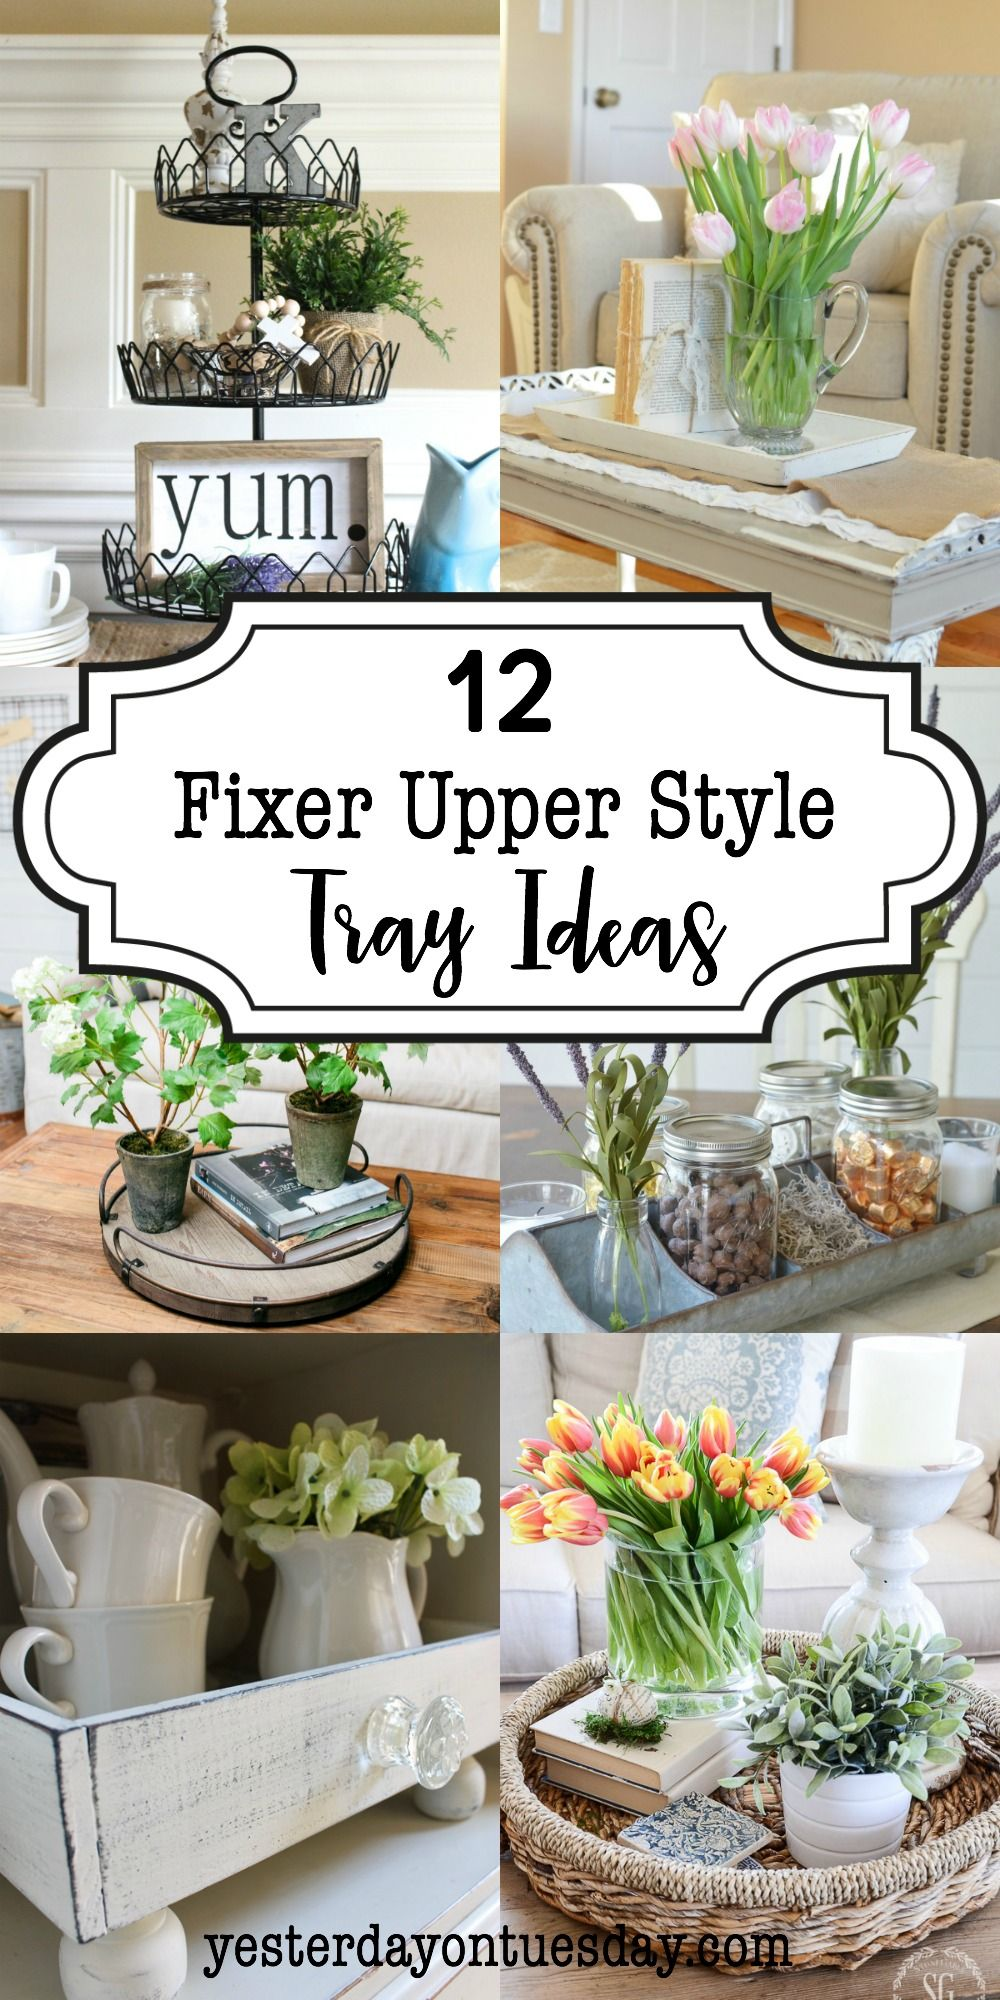 12 fixer upper style tray ideas lovely ways to add a modern farmhouse look to - Modern Farmhouse Decor